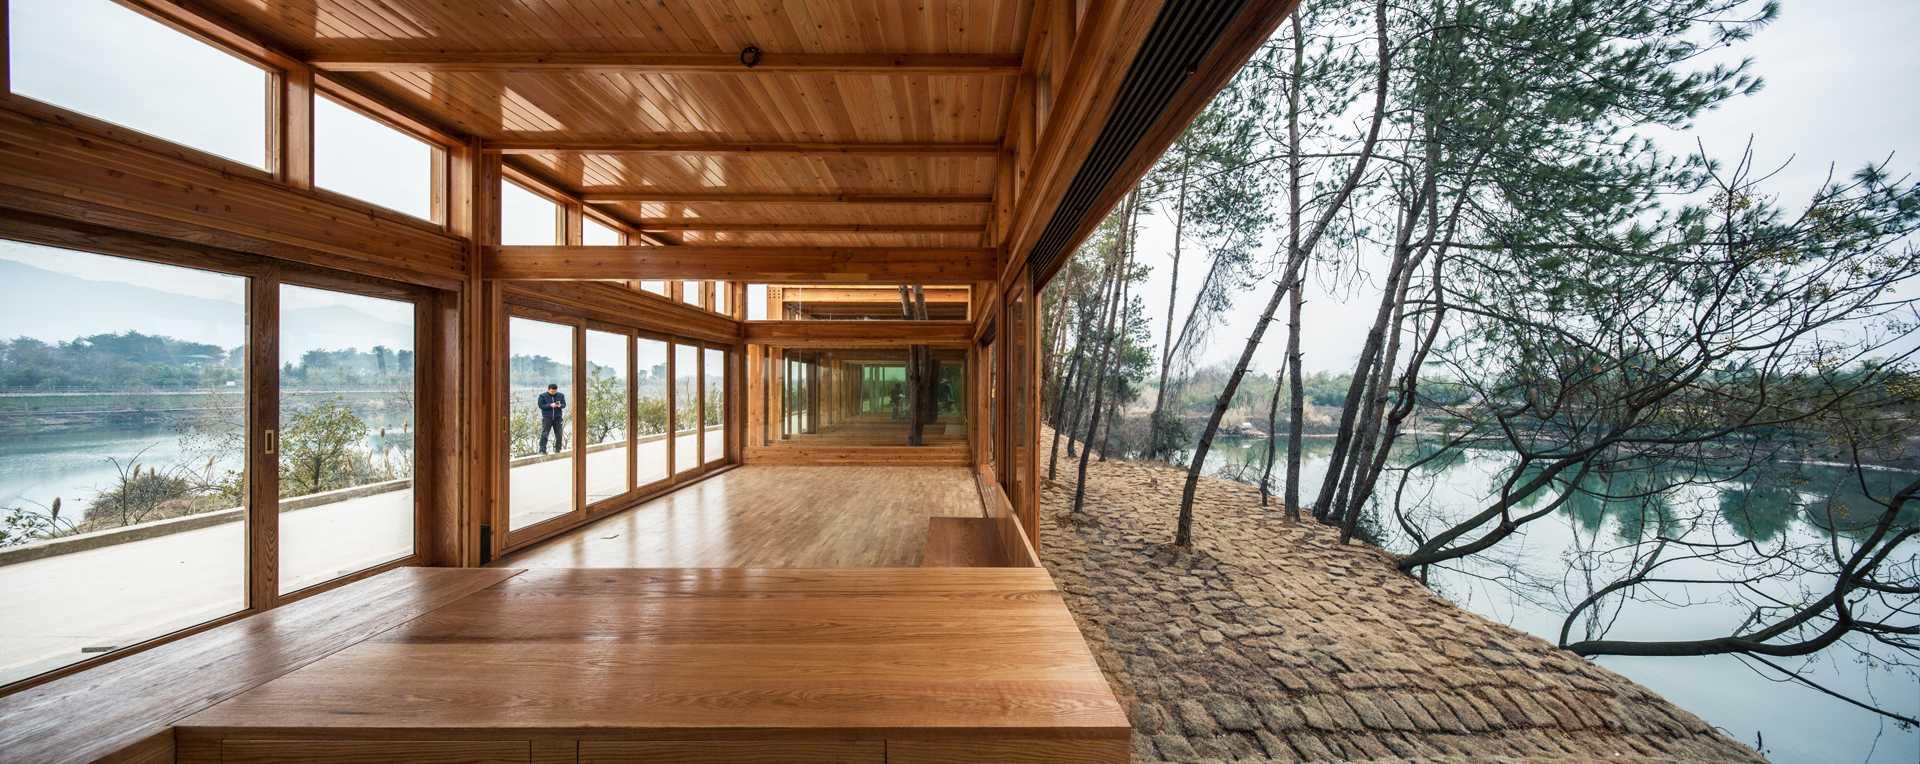 Pine Pavilion  - 16 05 39